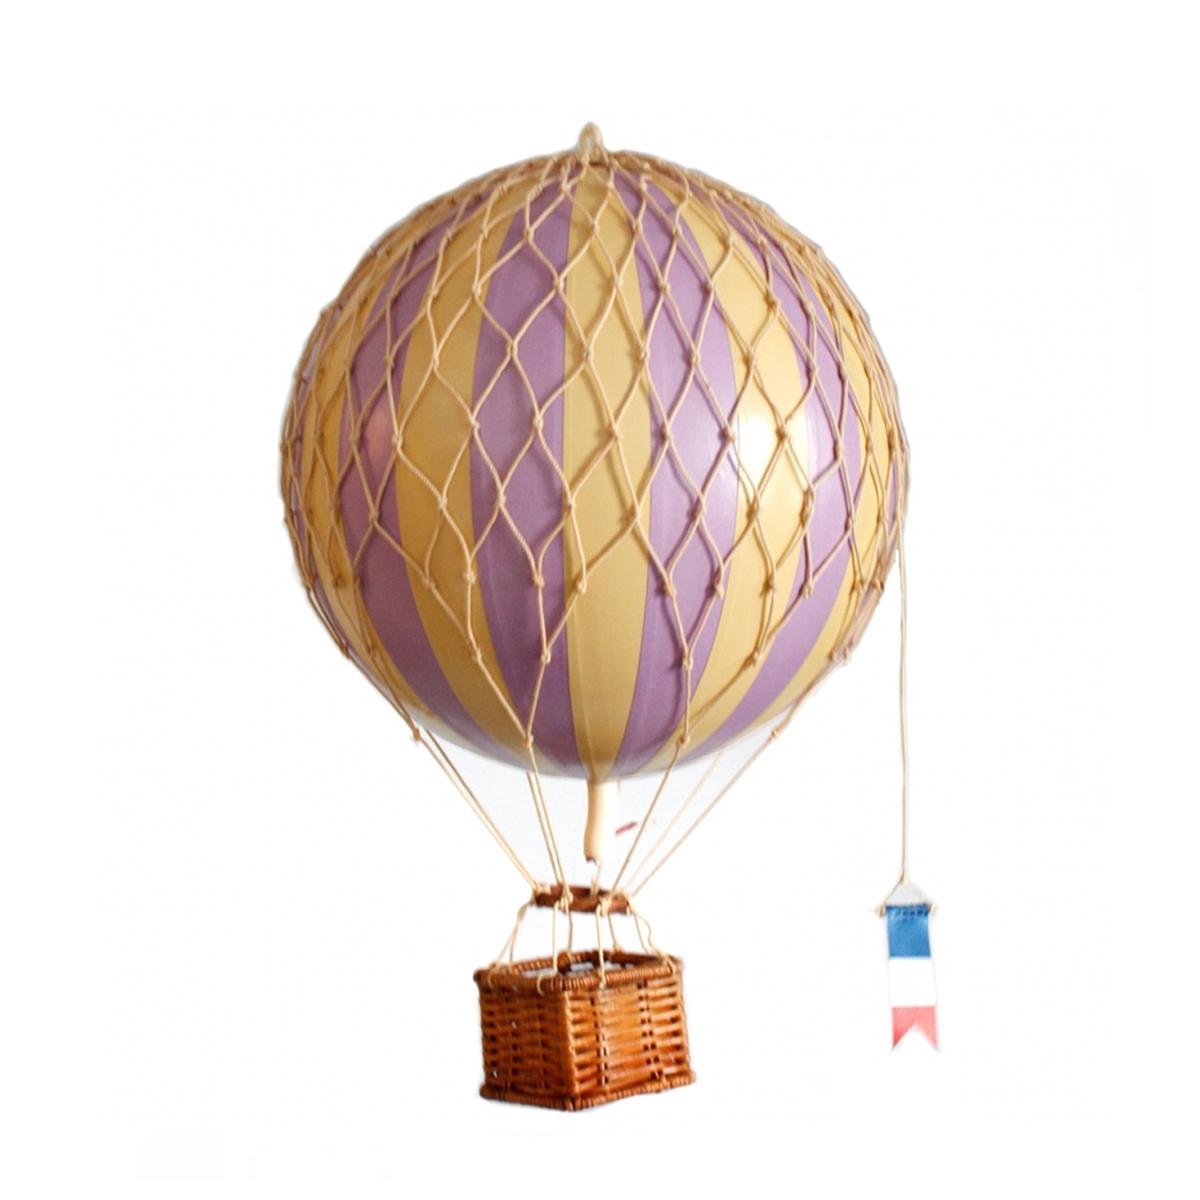 Image of Authentic Models luftballon 18 cm - lavender